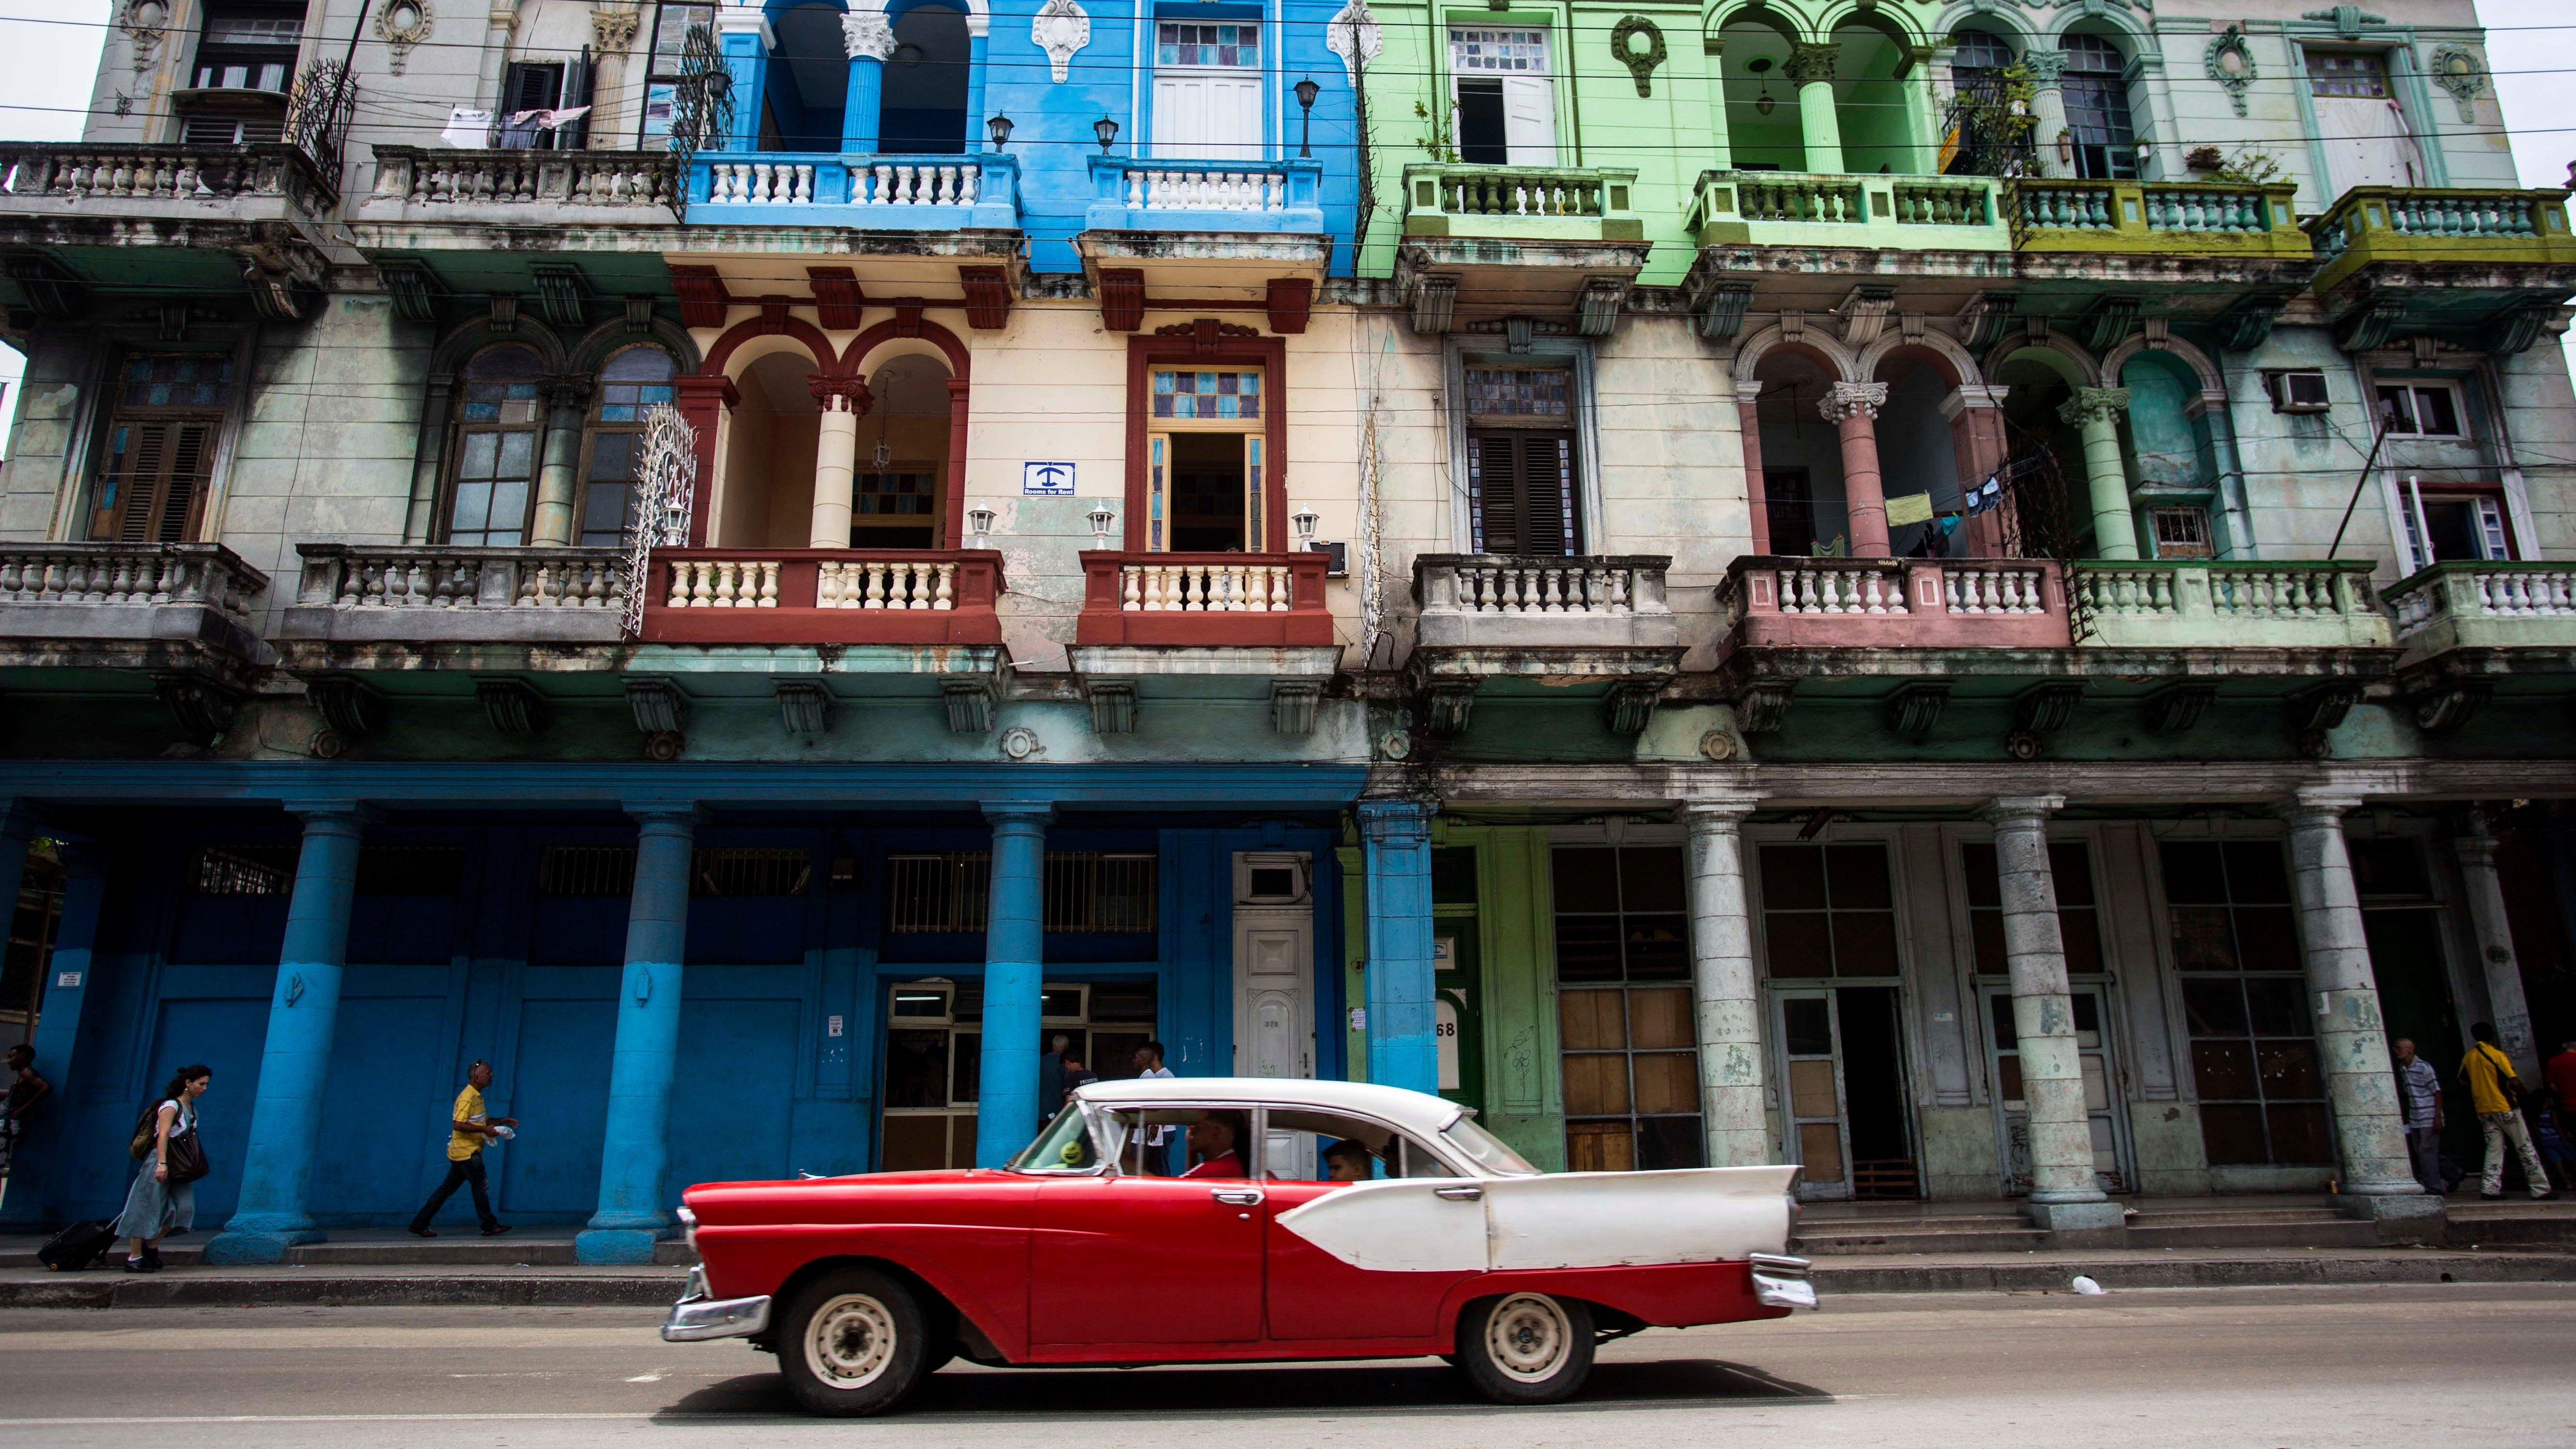 A man drives a classic America car past a row of multi-colored facades on Infantas Street in Havana, Cuba, Saturday, June 2, 2018. Cuban legislators took the first step Saturday toward drafting a new constitution.